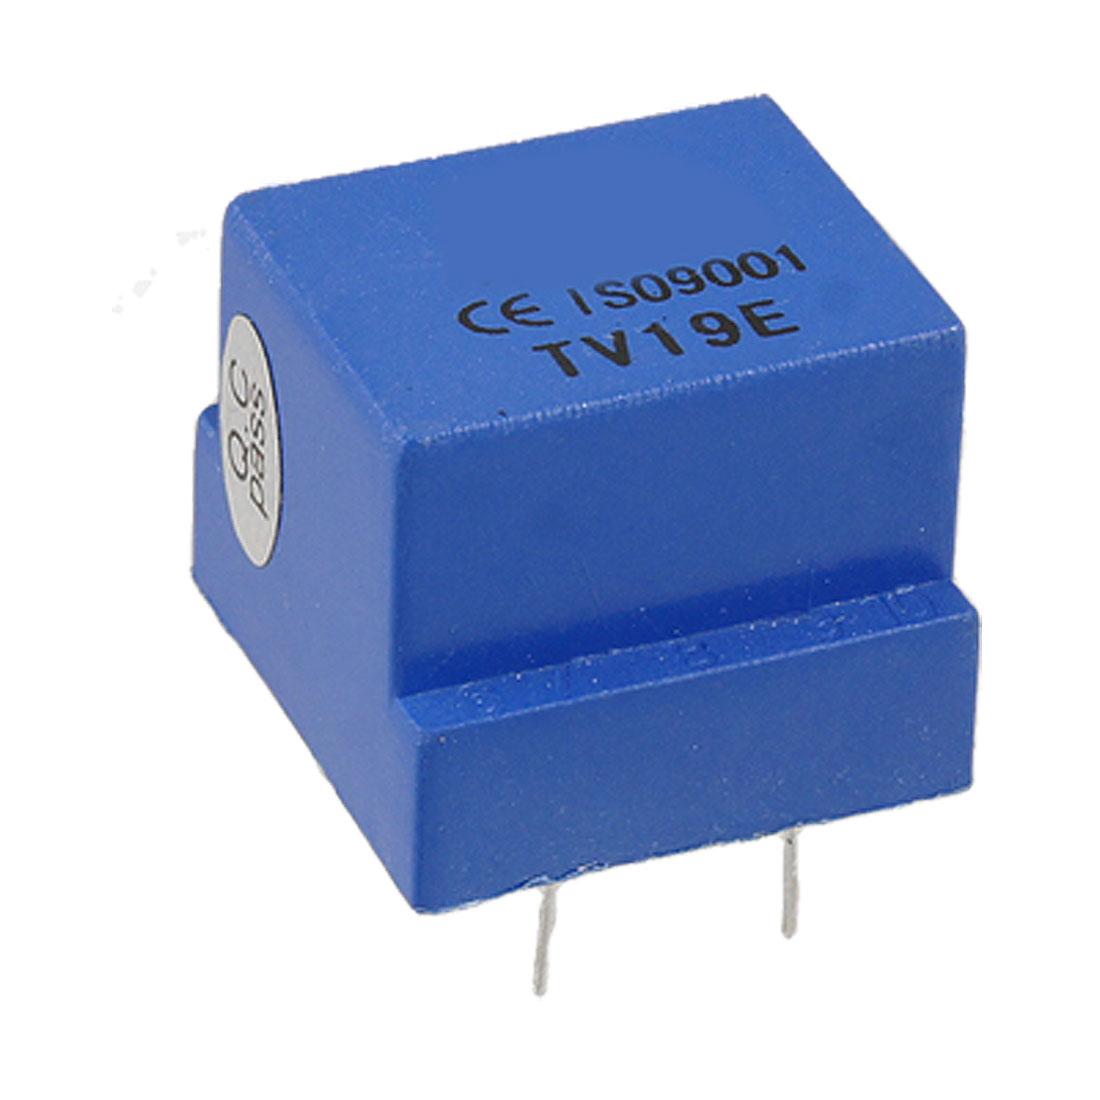 TV19E 4 Pin Enclosed 500ohm Resisitance Voltage Transformer Blue